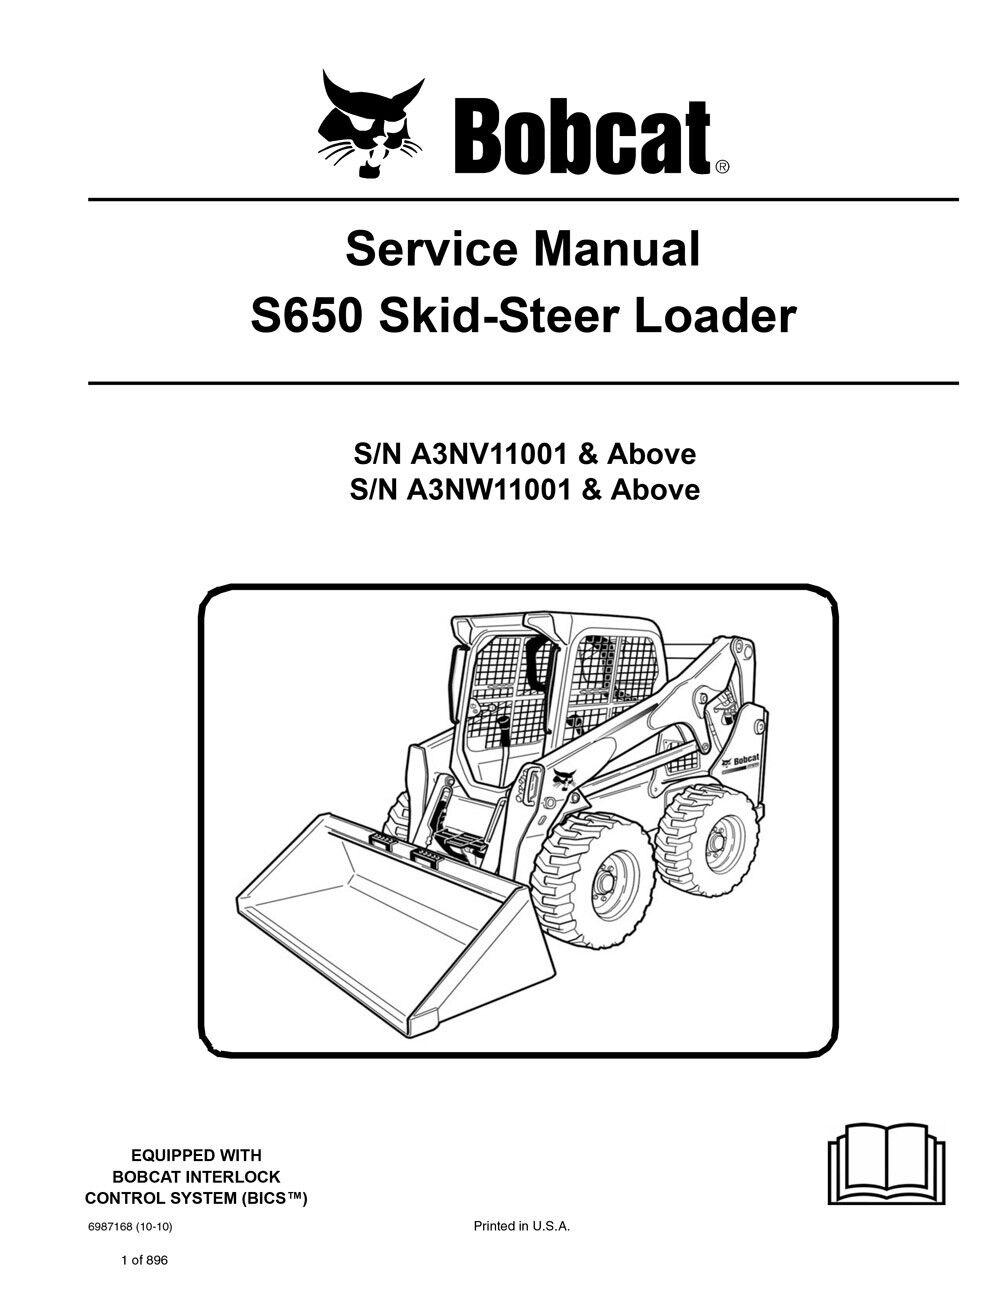 642 Bobcat Service Manual Wiring Diagram